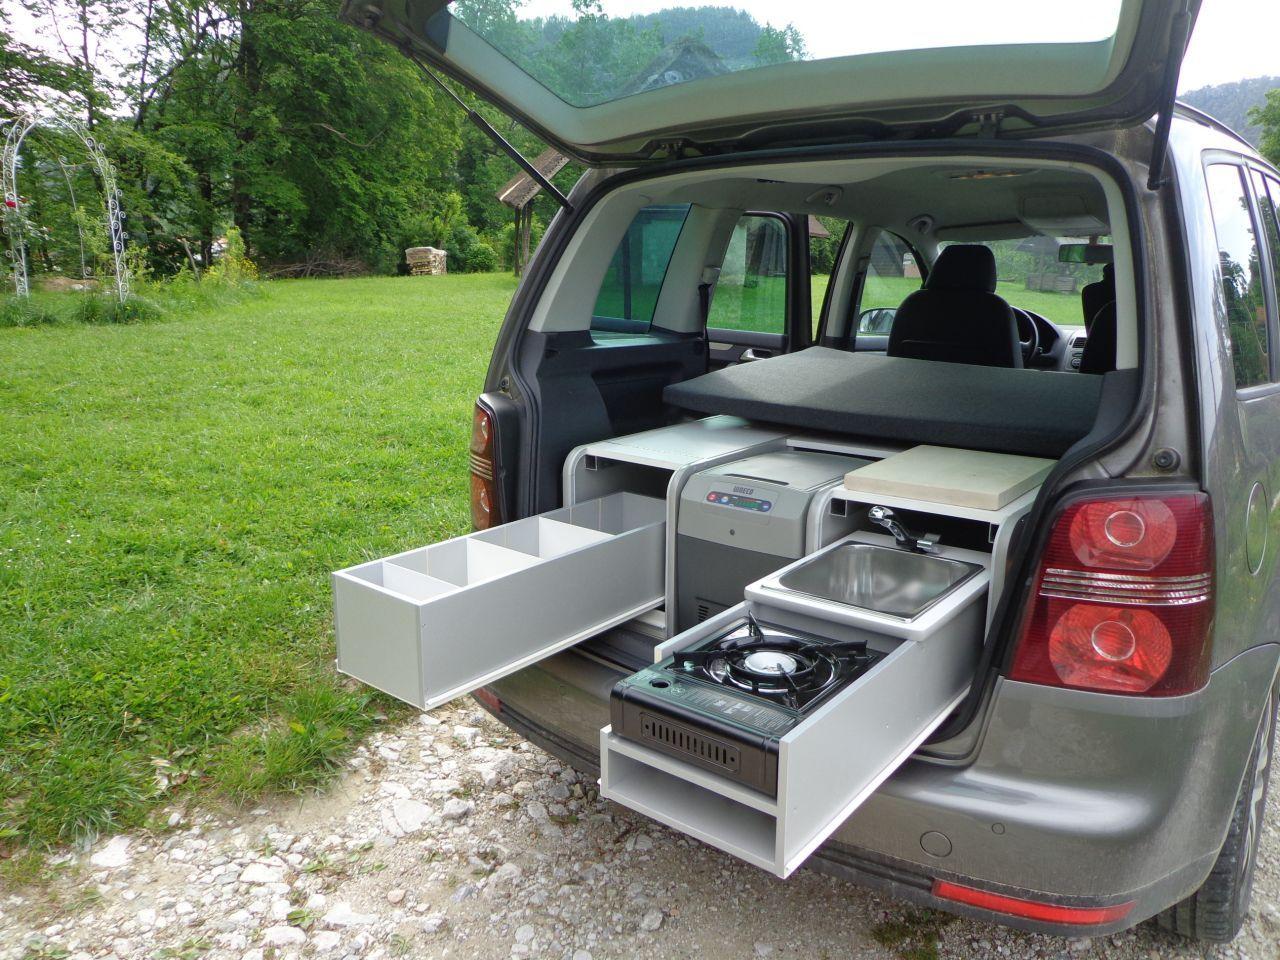 sipras flip otos predelave material suv camping. Black Bedroom Furniture Sets. Home Design Ideas